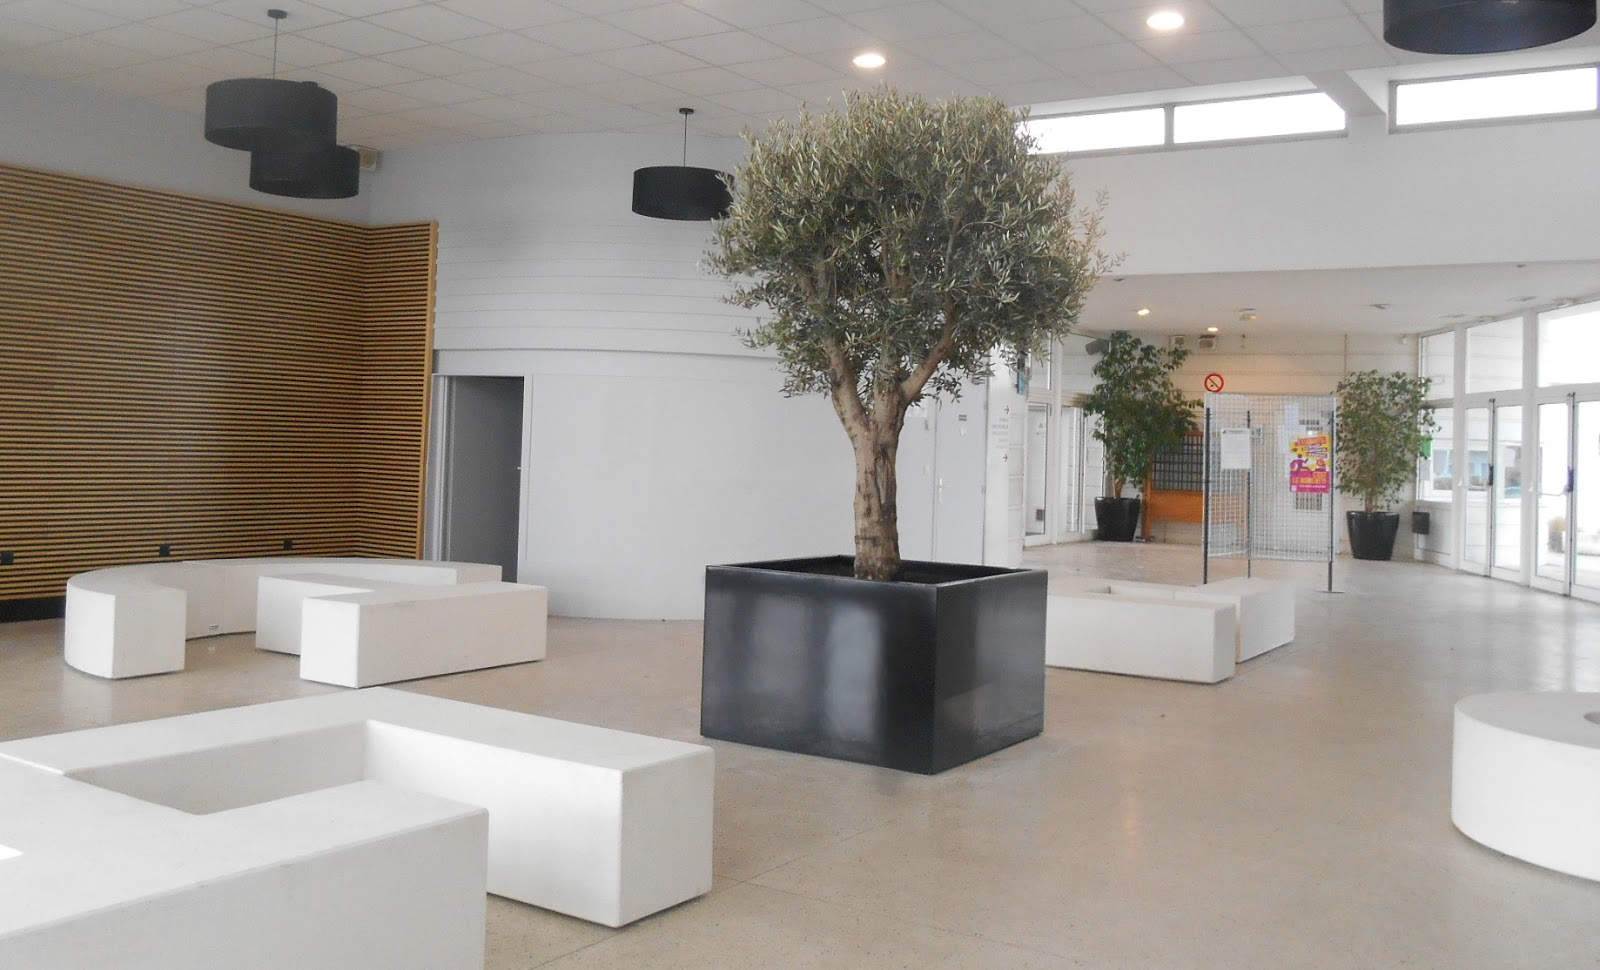 galerie photos bacs sur mesure image 39 in le bac arbre indoor image 39 in. Black Bedroom Furniture Sets. Home Design Ideas